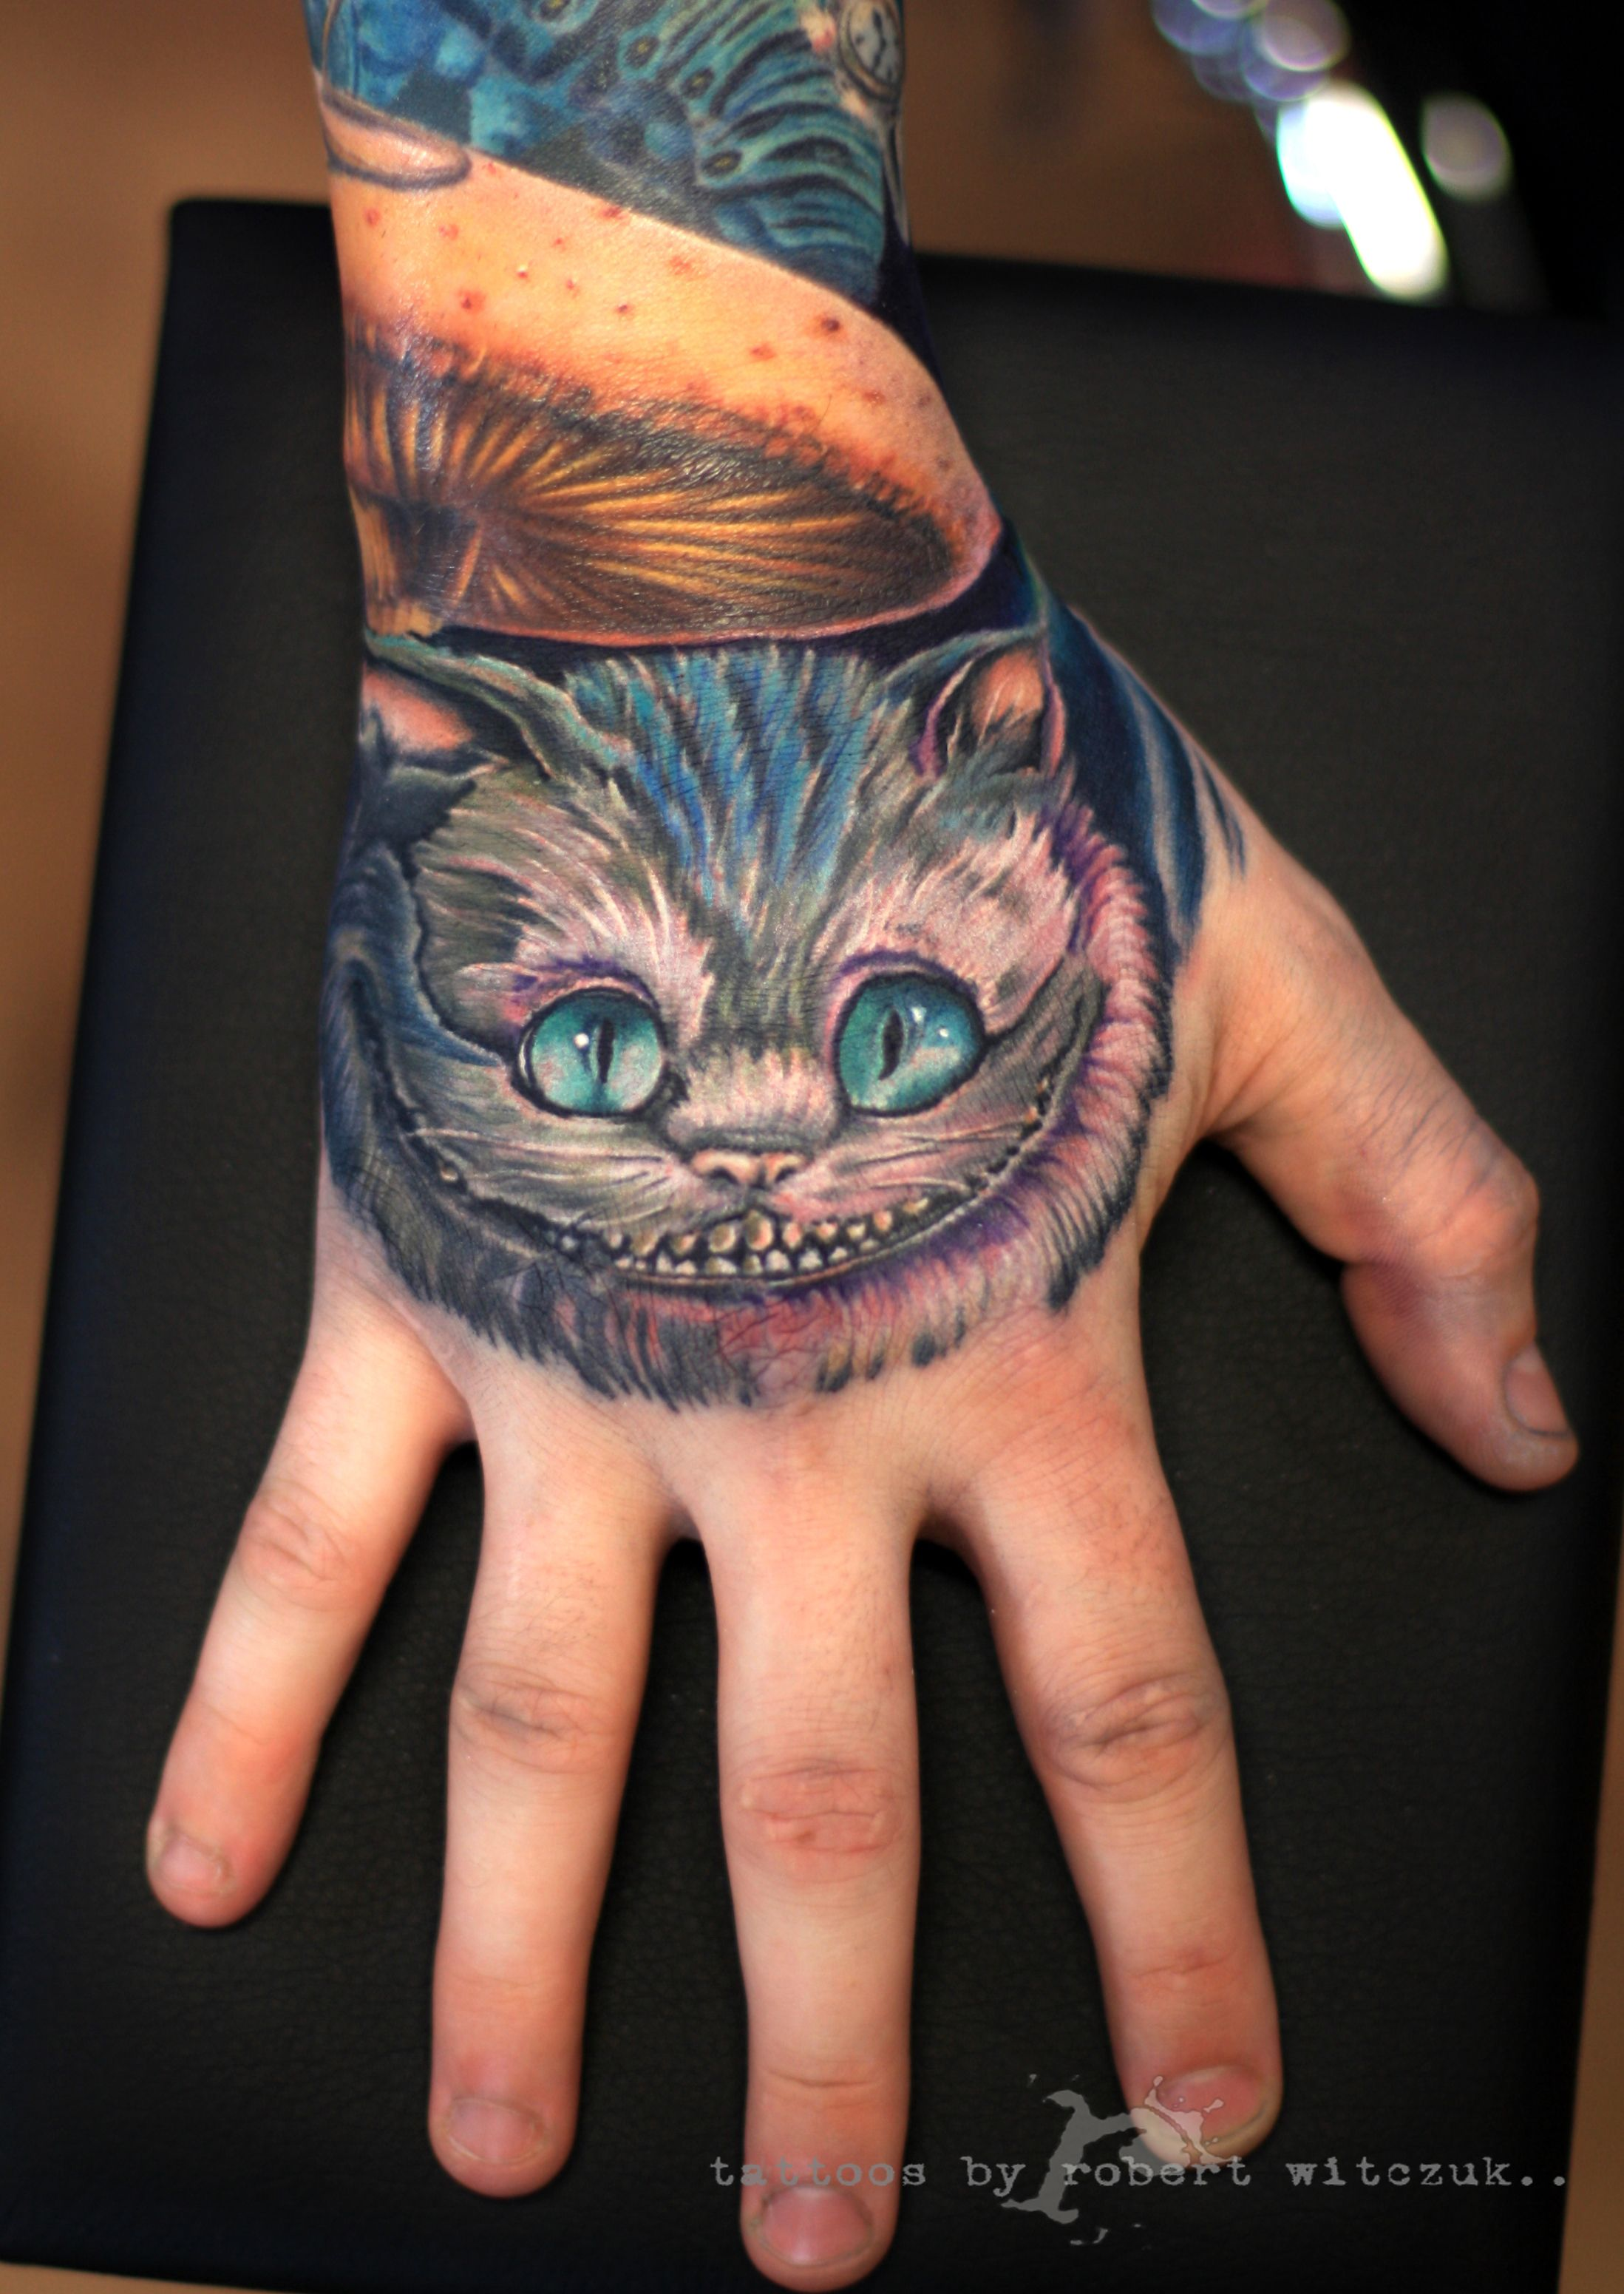 Alice in Wonderland Tattoo by Robert Witczuk (5) | Tattoos | Pinterest